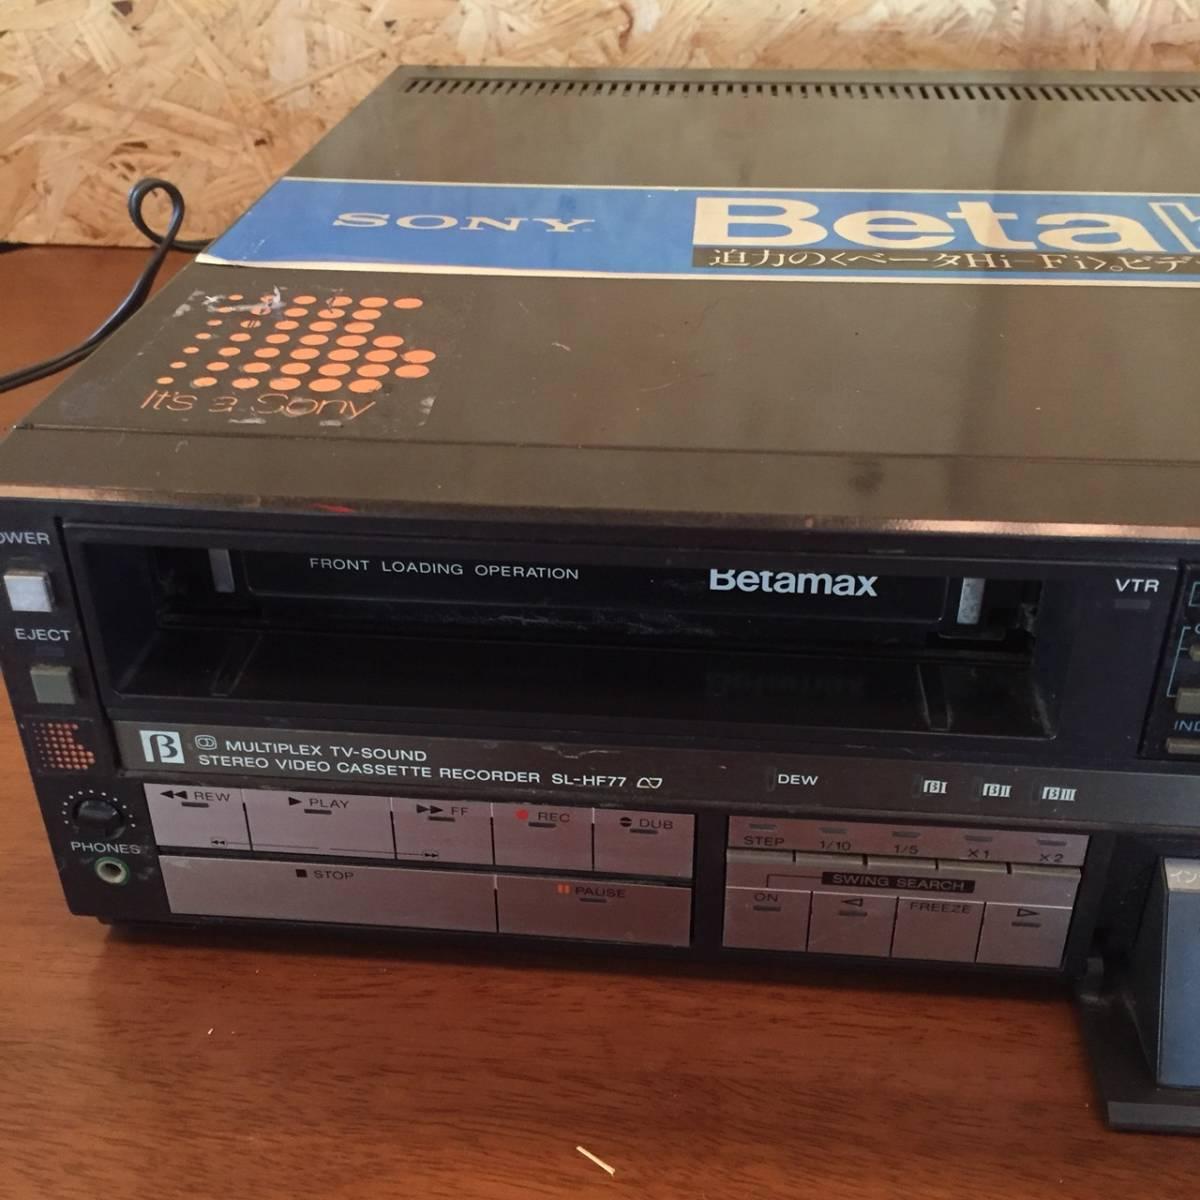 O1-567-0818 SONY Beta ベータビデオデッキ Hi-Fi SL-HF77 通電確認のみなので、ジャンク出品_画像6